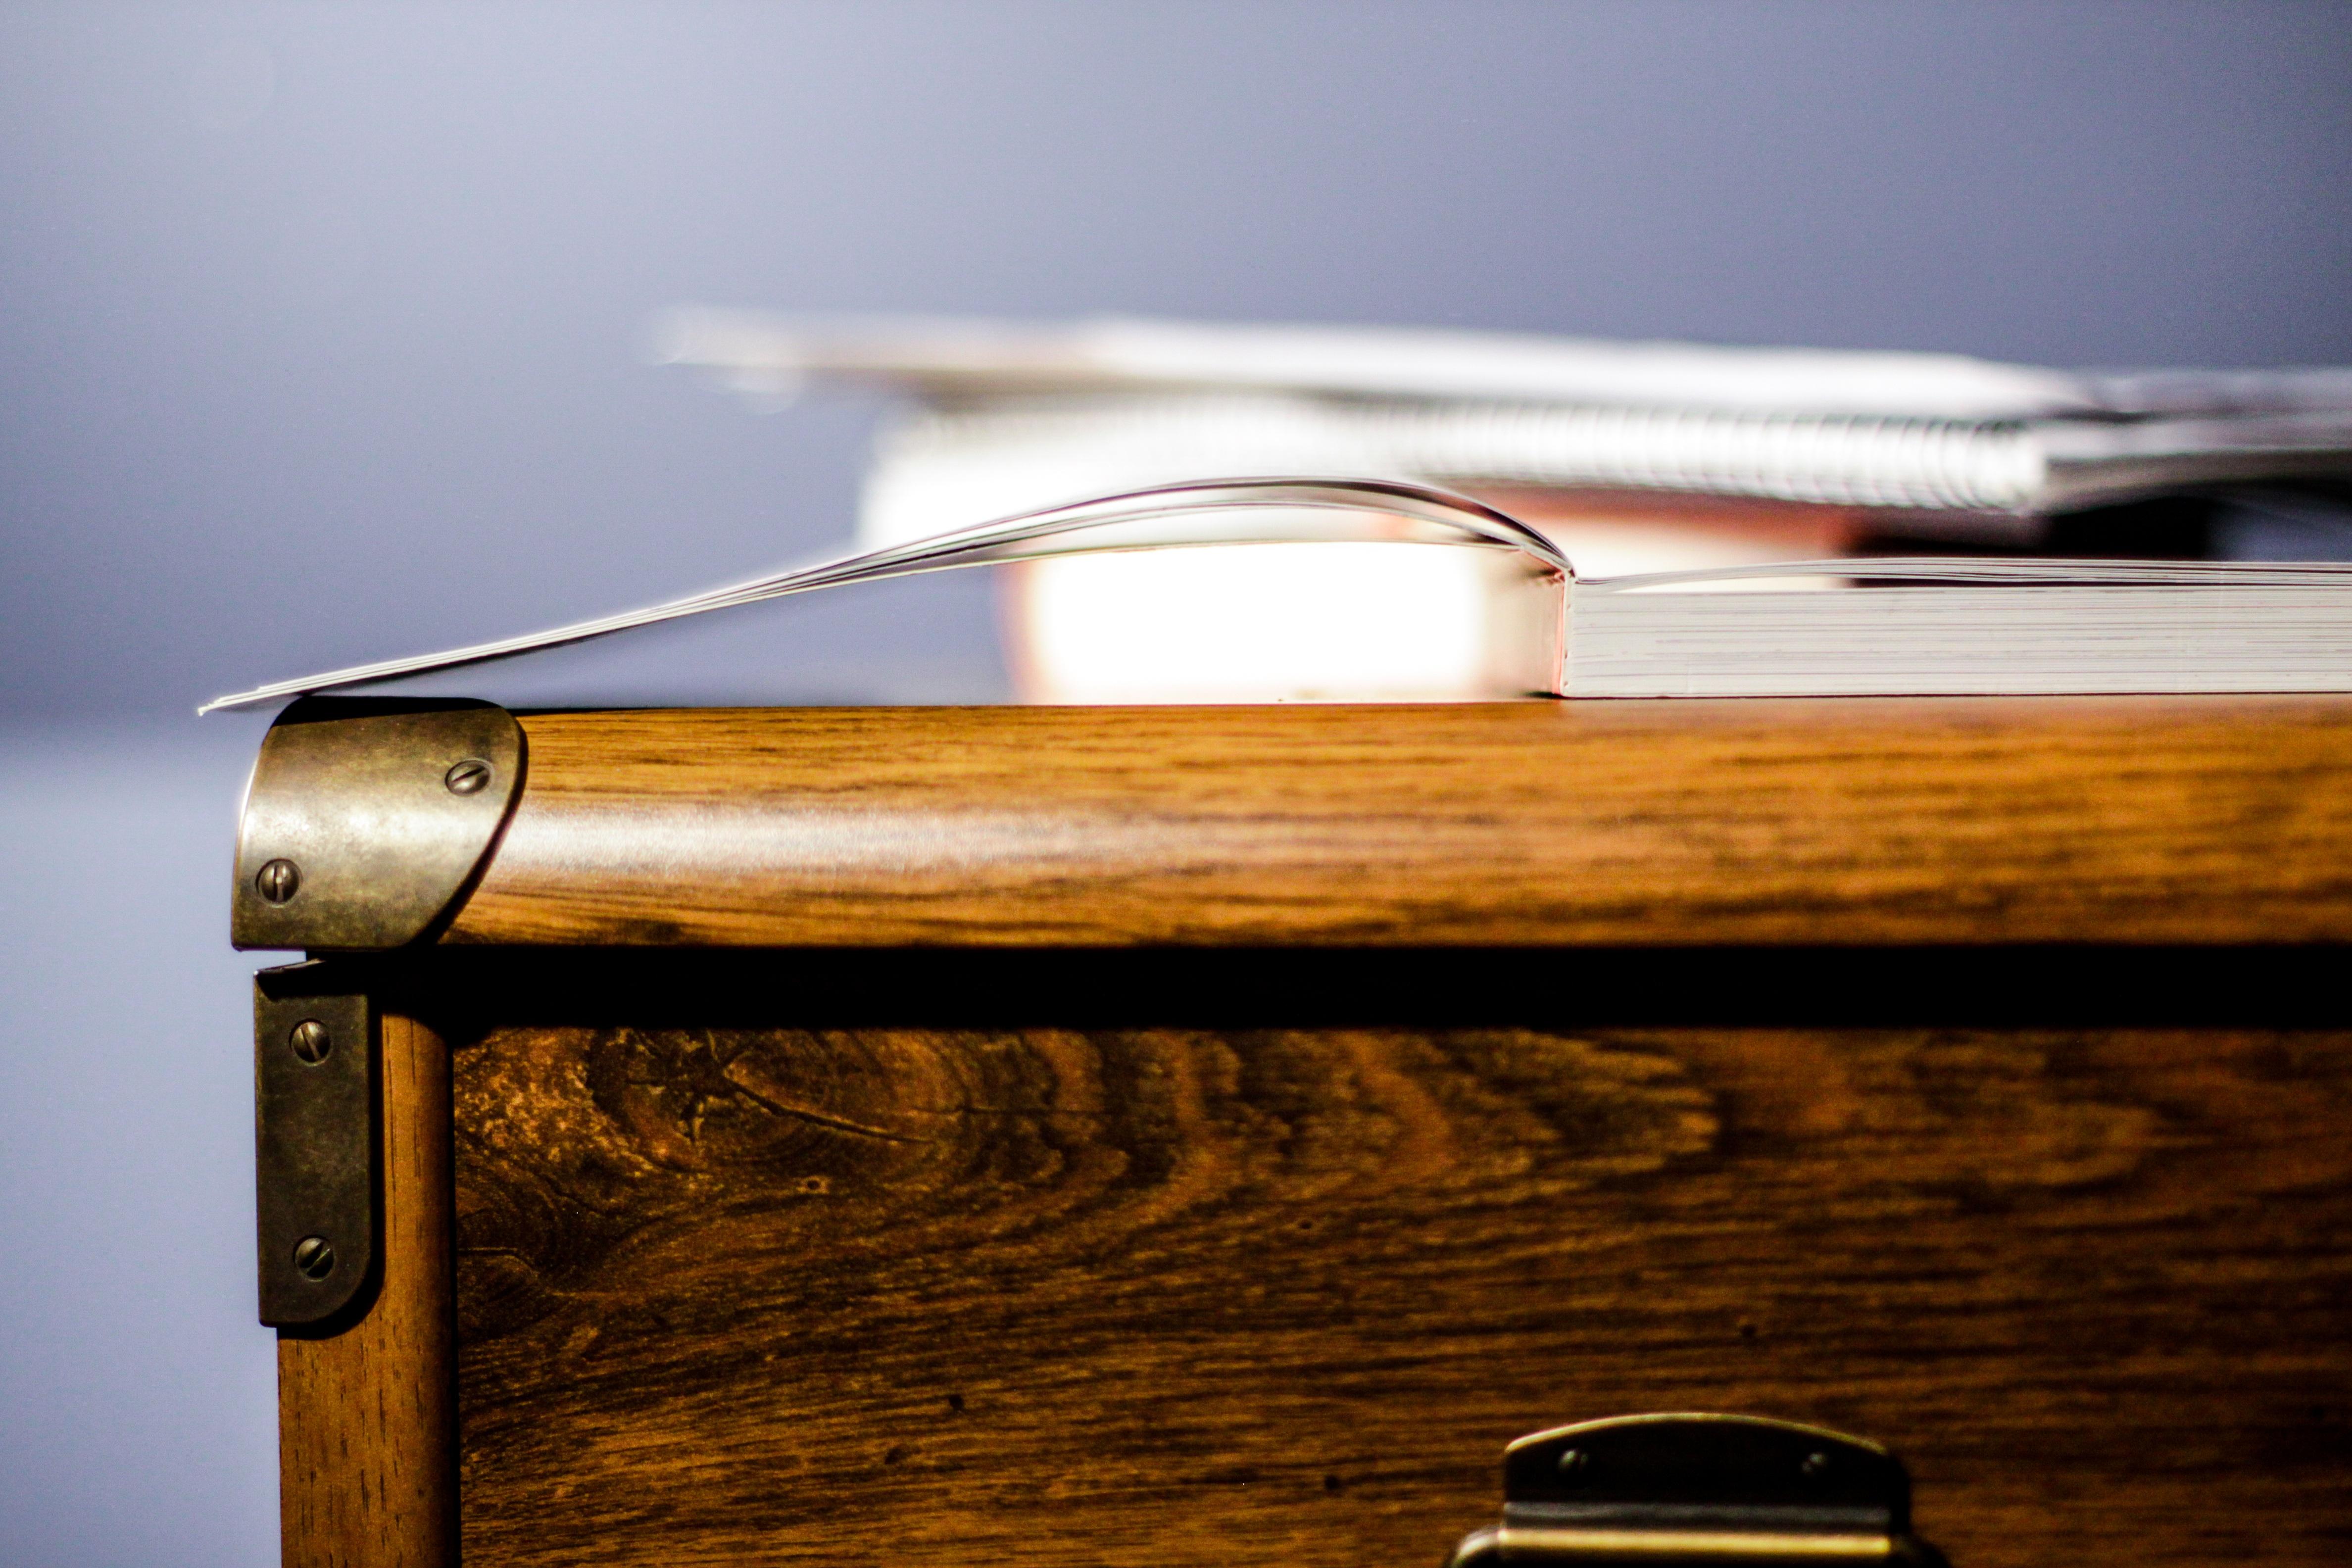 Desk Notebook Table Book Wood Guitar Brown Furniture Surface Drawer Cabinet  Glasses Wooden String Instrument